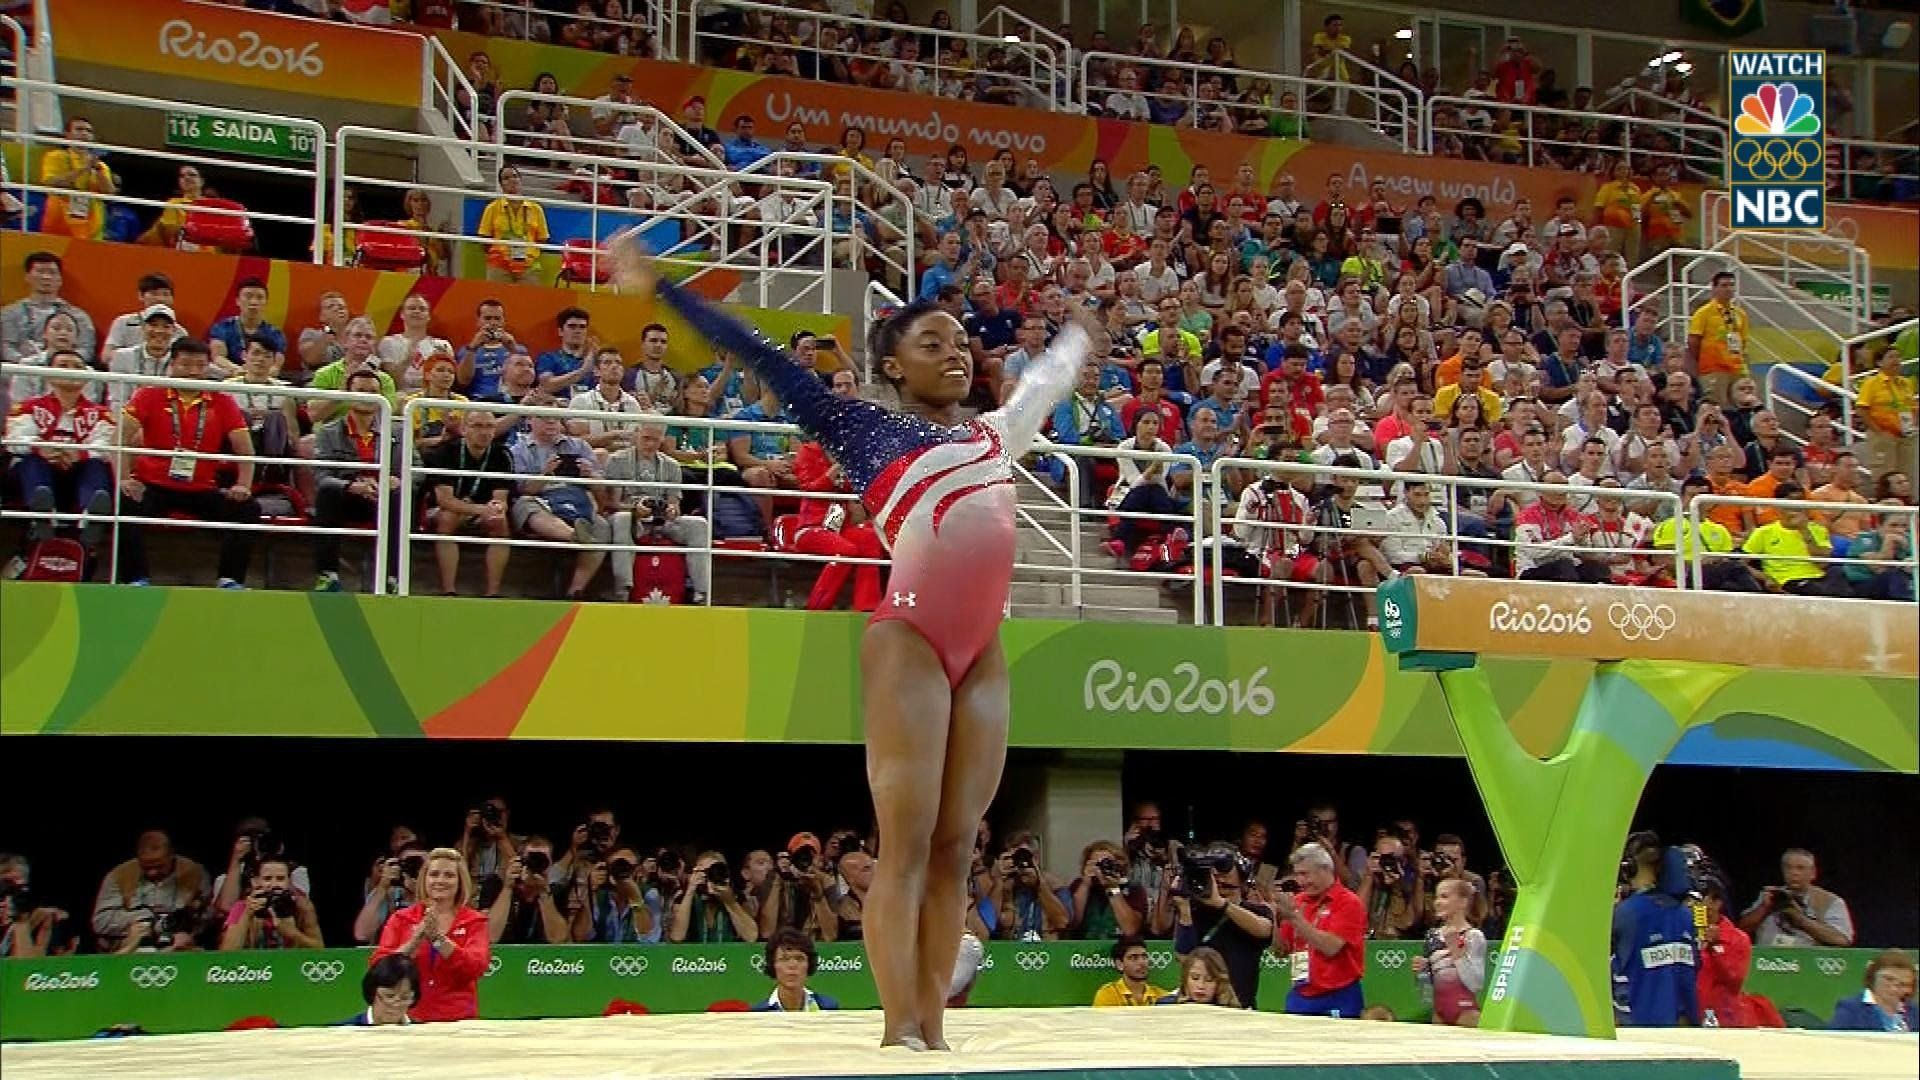 Simone Biles locks up gold for Team USA on beam